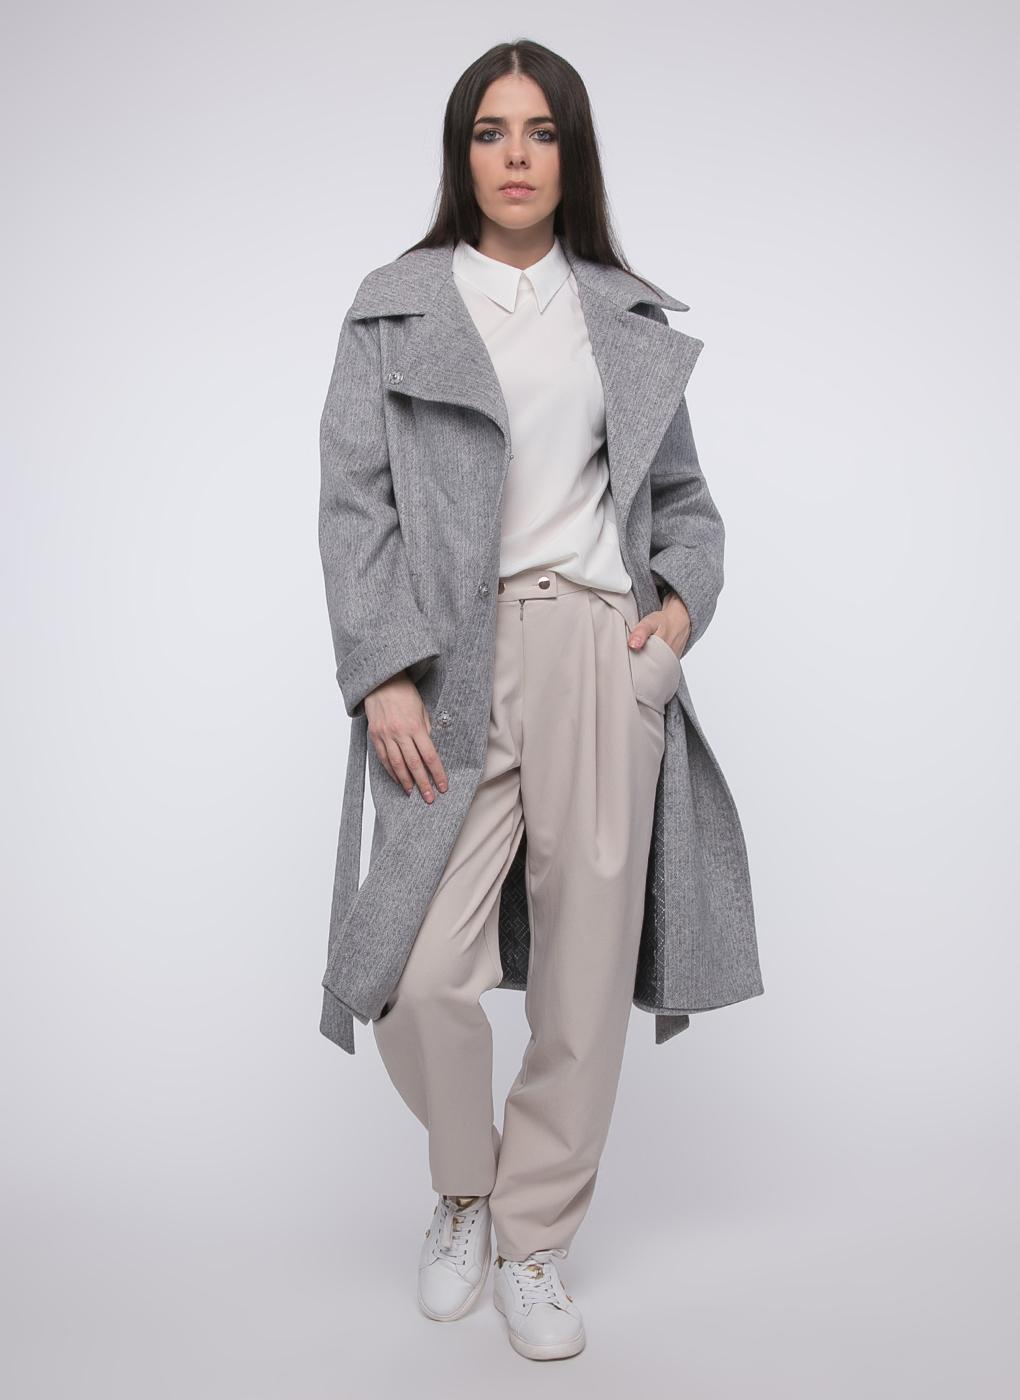 Пальто прямое шерстяное 58, idekka фото